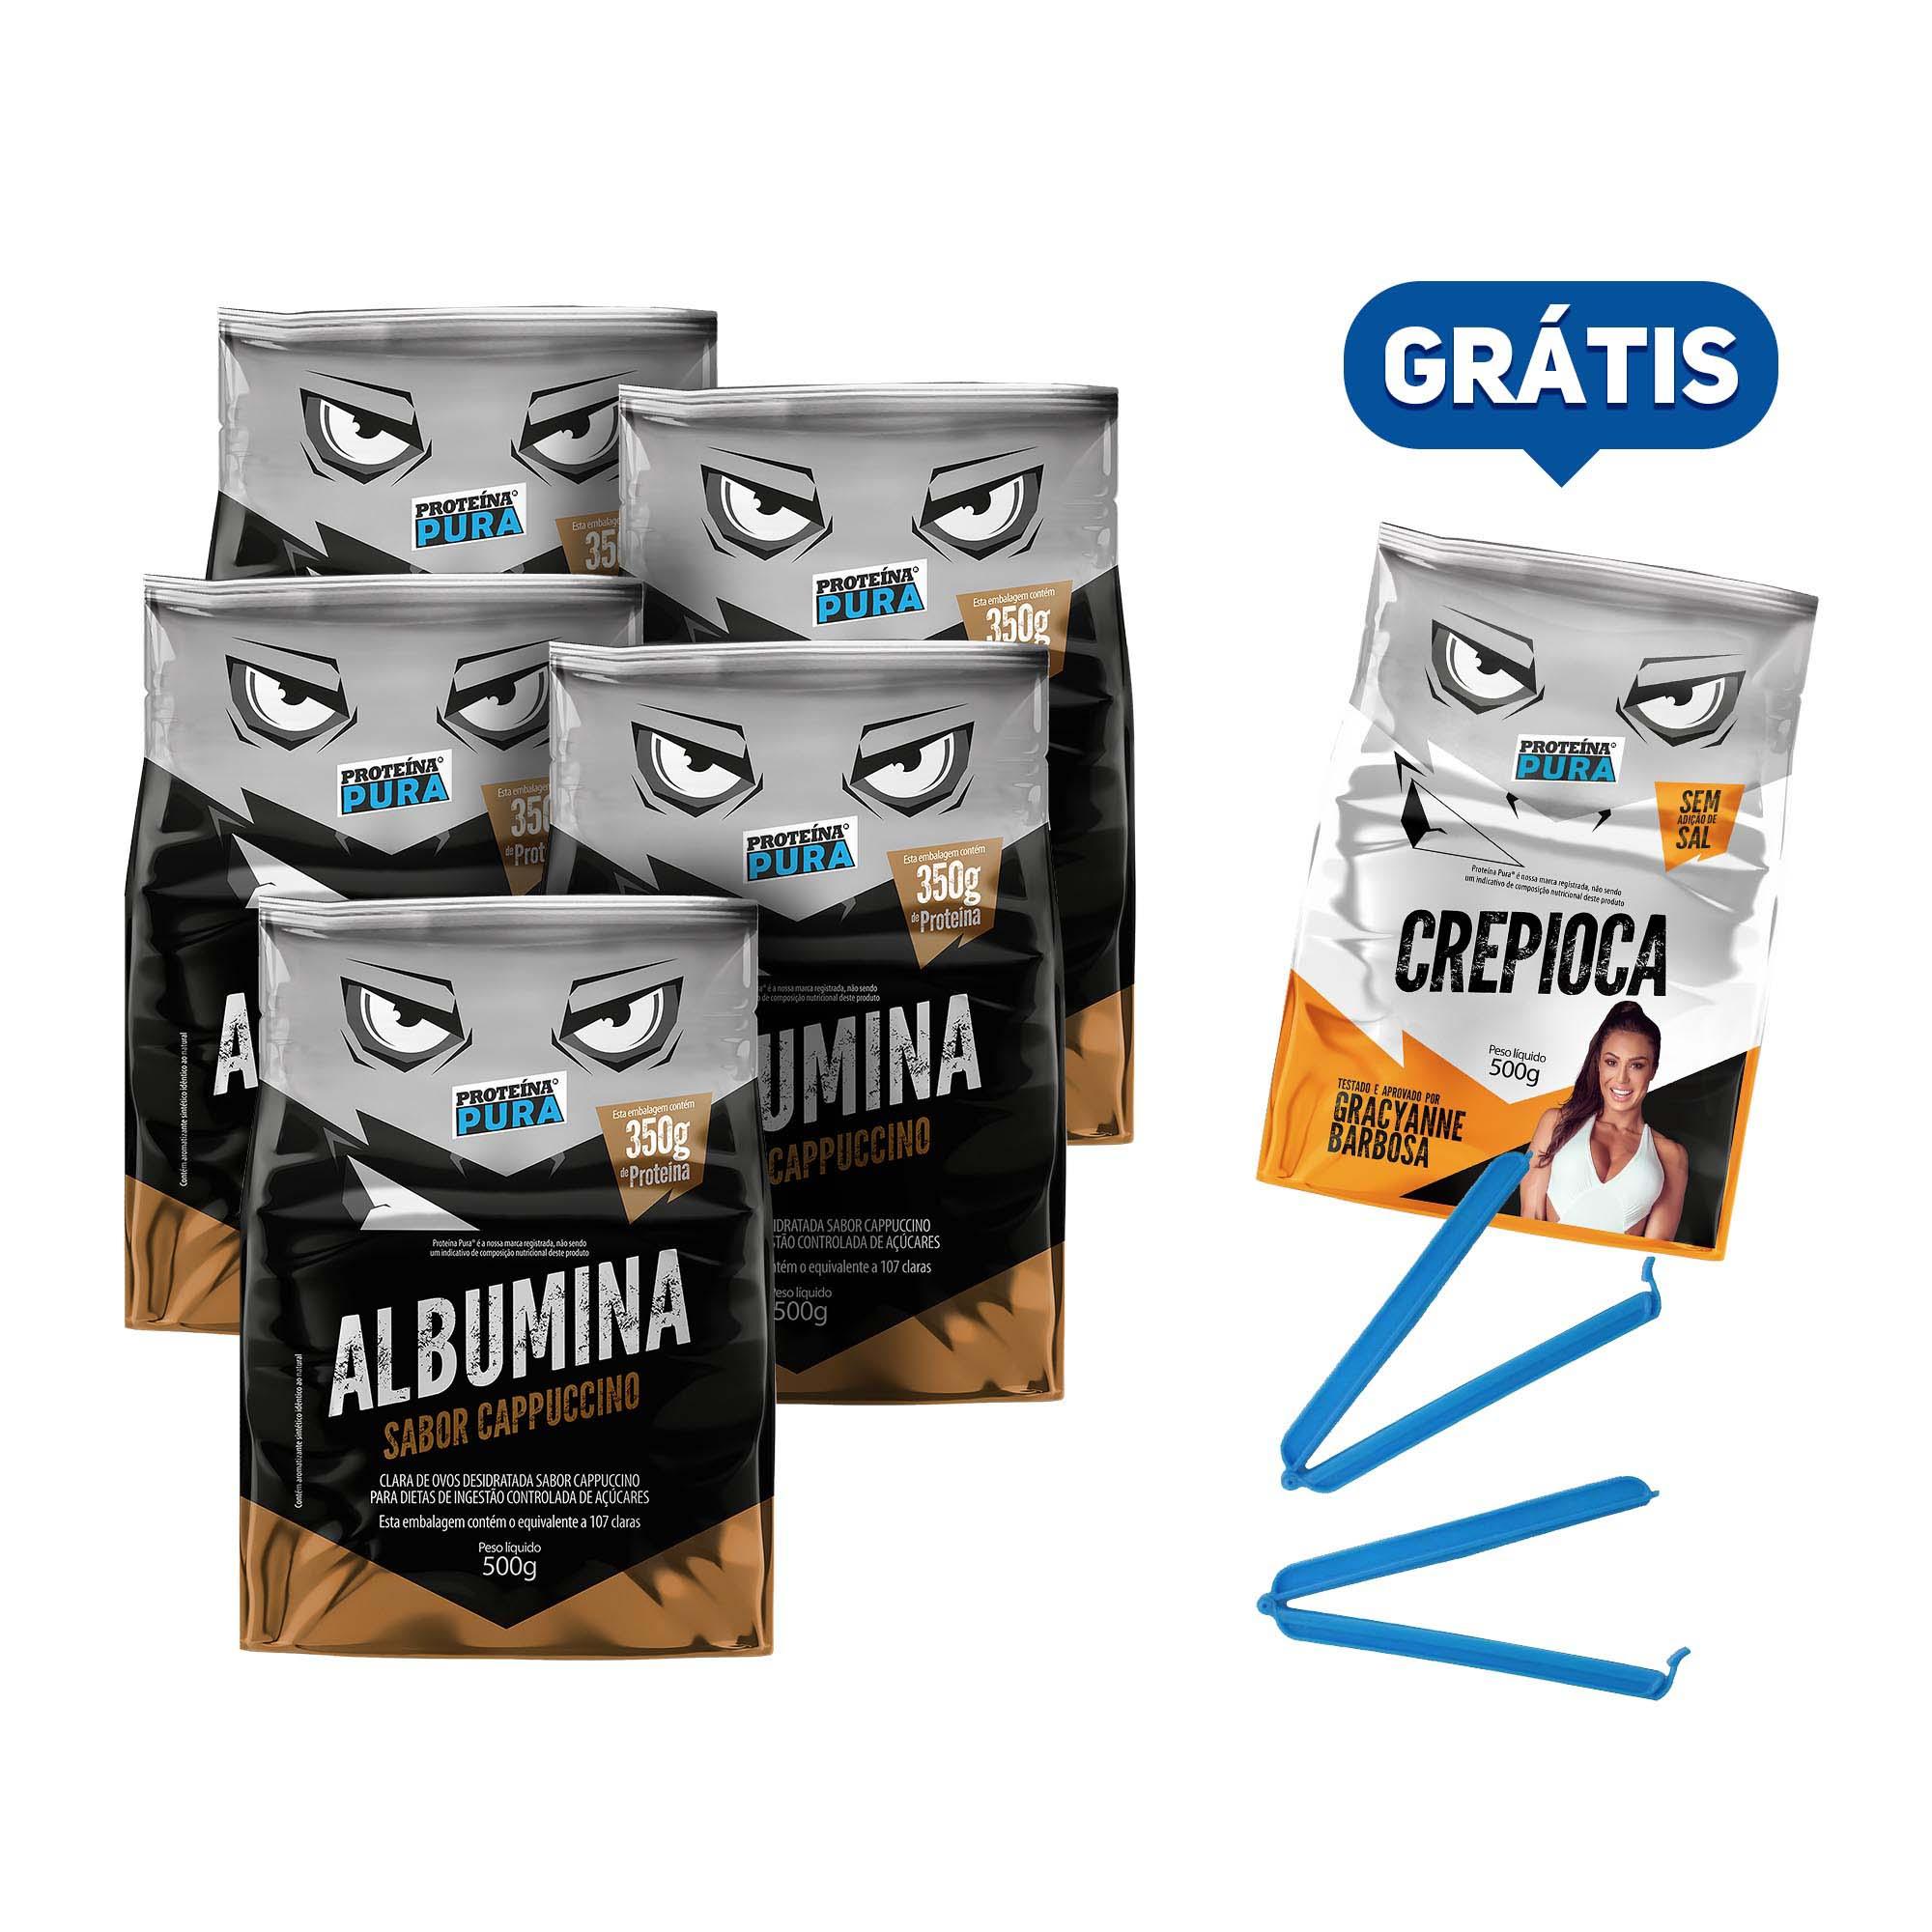 Kit Albumina Cappuccino - (5 un x 500g) - Proteína Pura